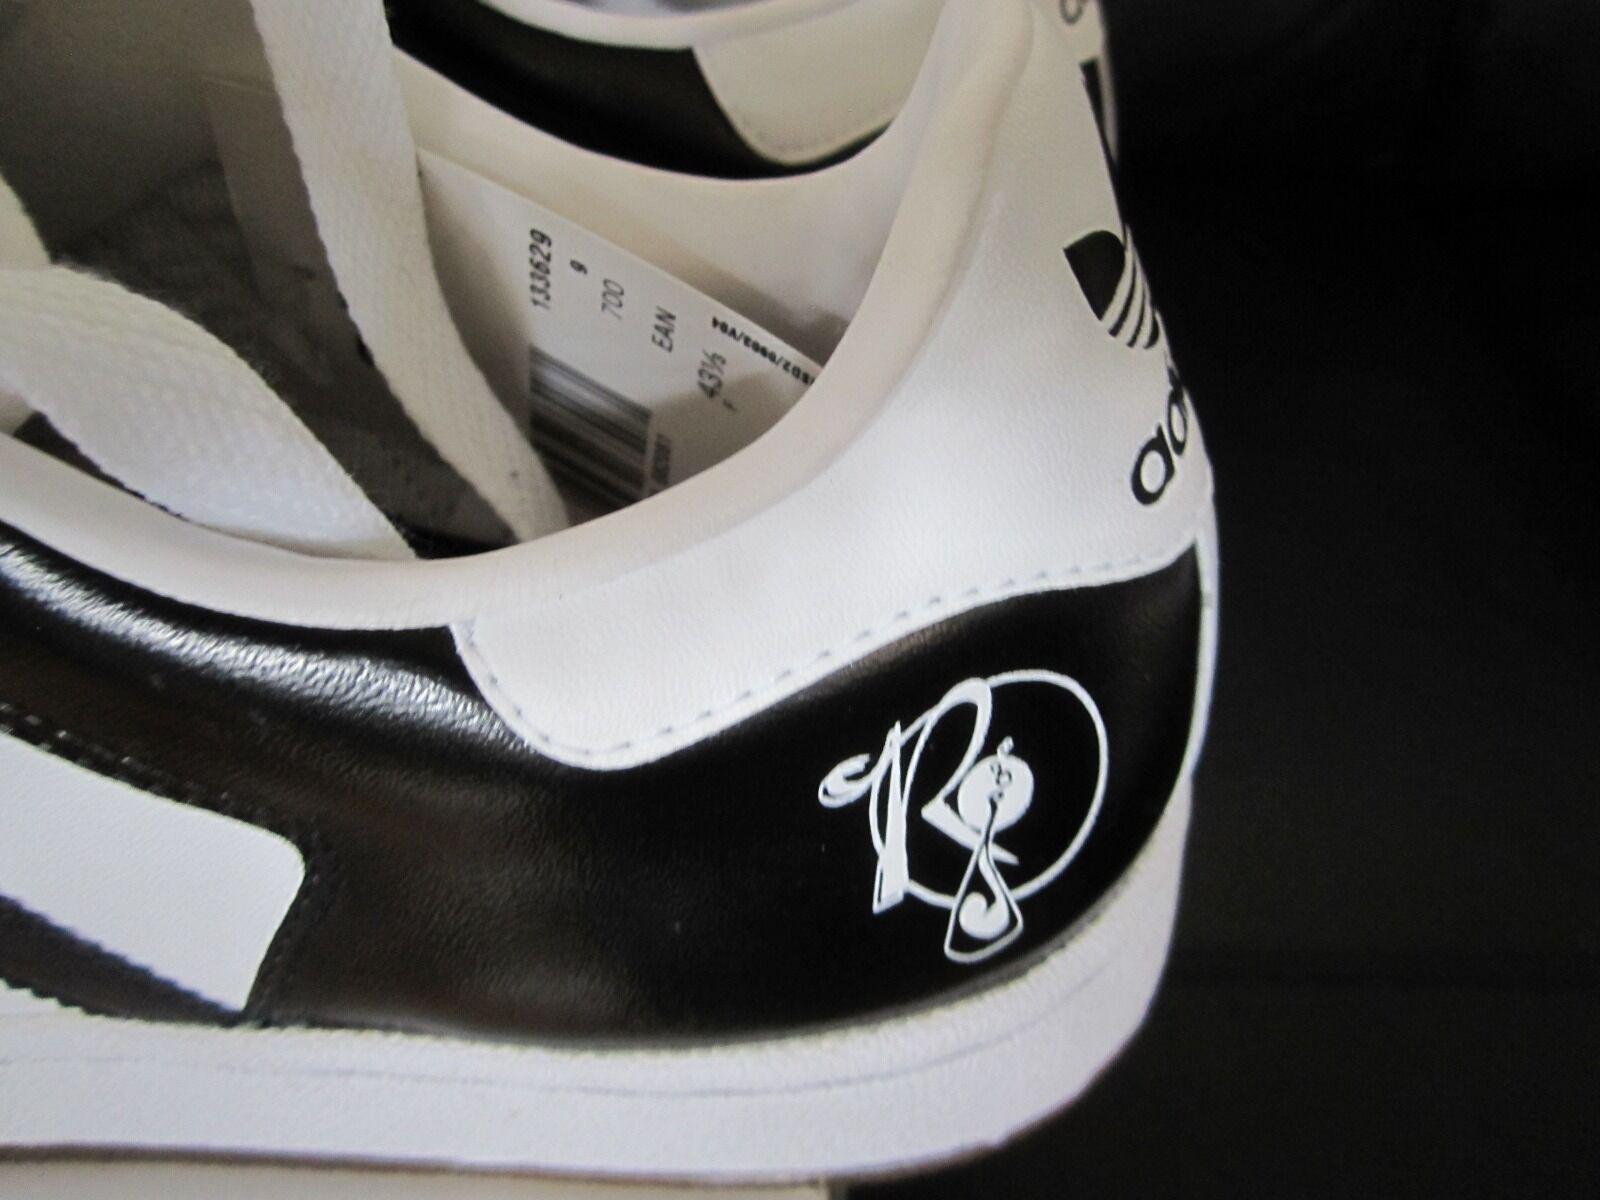 Adidas D.S 2004 35th Superstar rockafella rockafella rockafella Anniversary del Regno Unito taglia 9 9.5 U.S.A. ea9a61